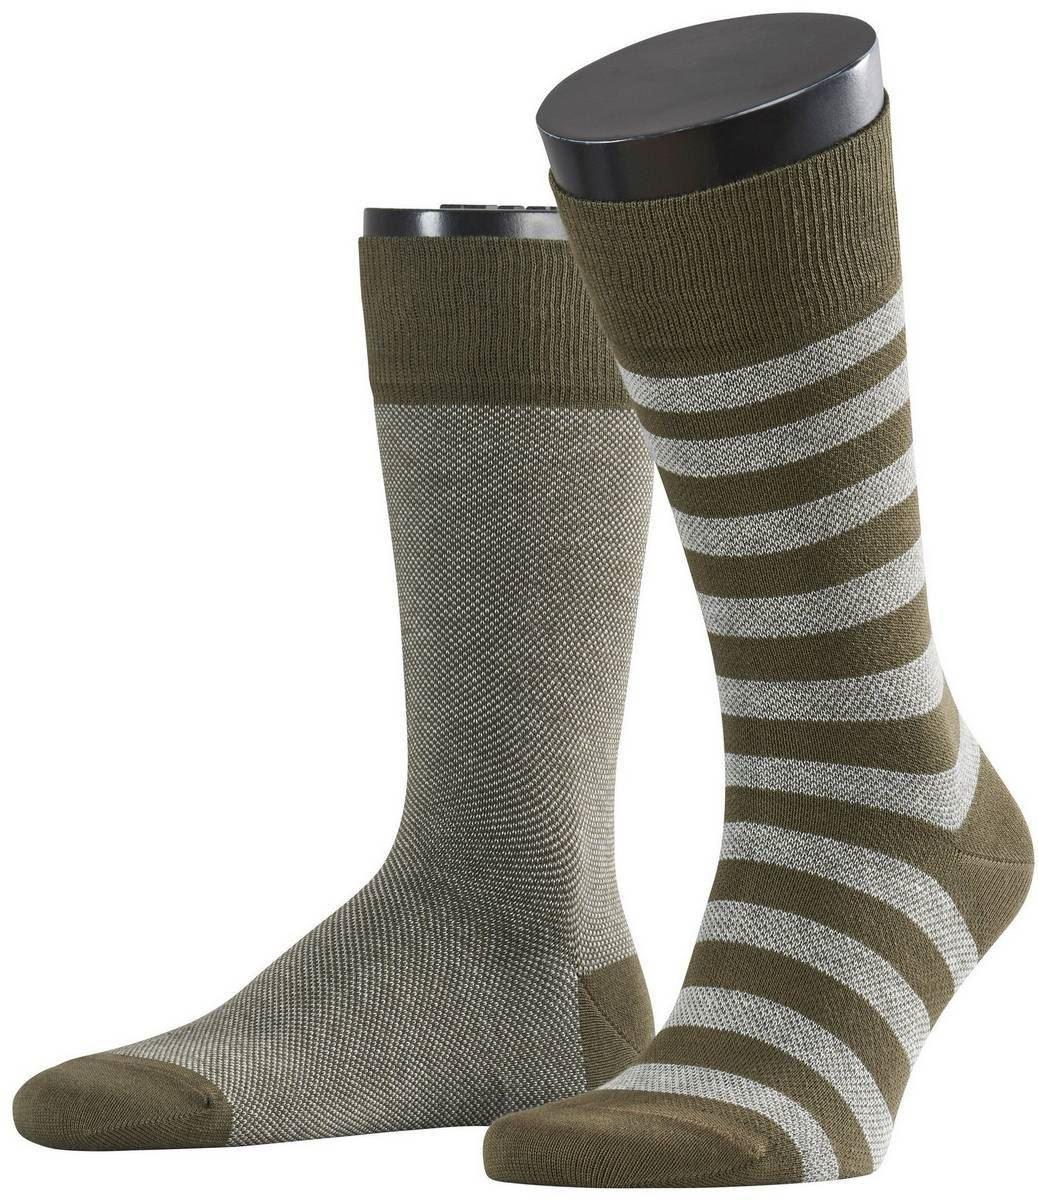 2aee4389ccc2b Esprit Mens Pique Stripe 2 Pack Socks - Hunter Green/Grey   eBay